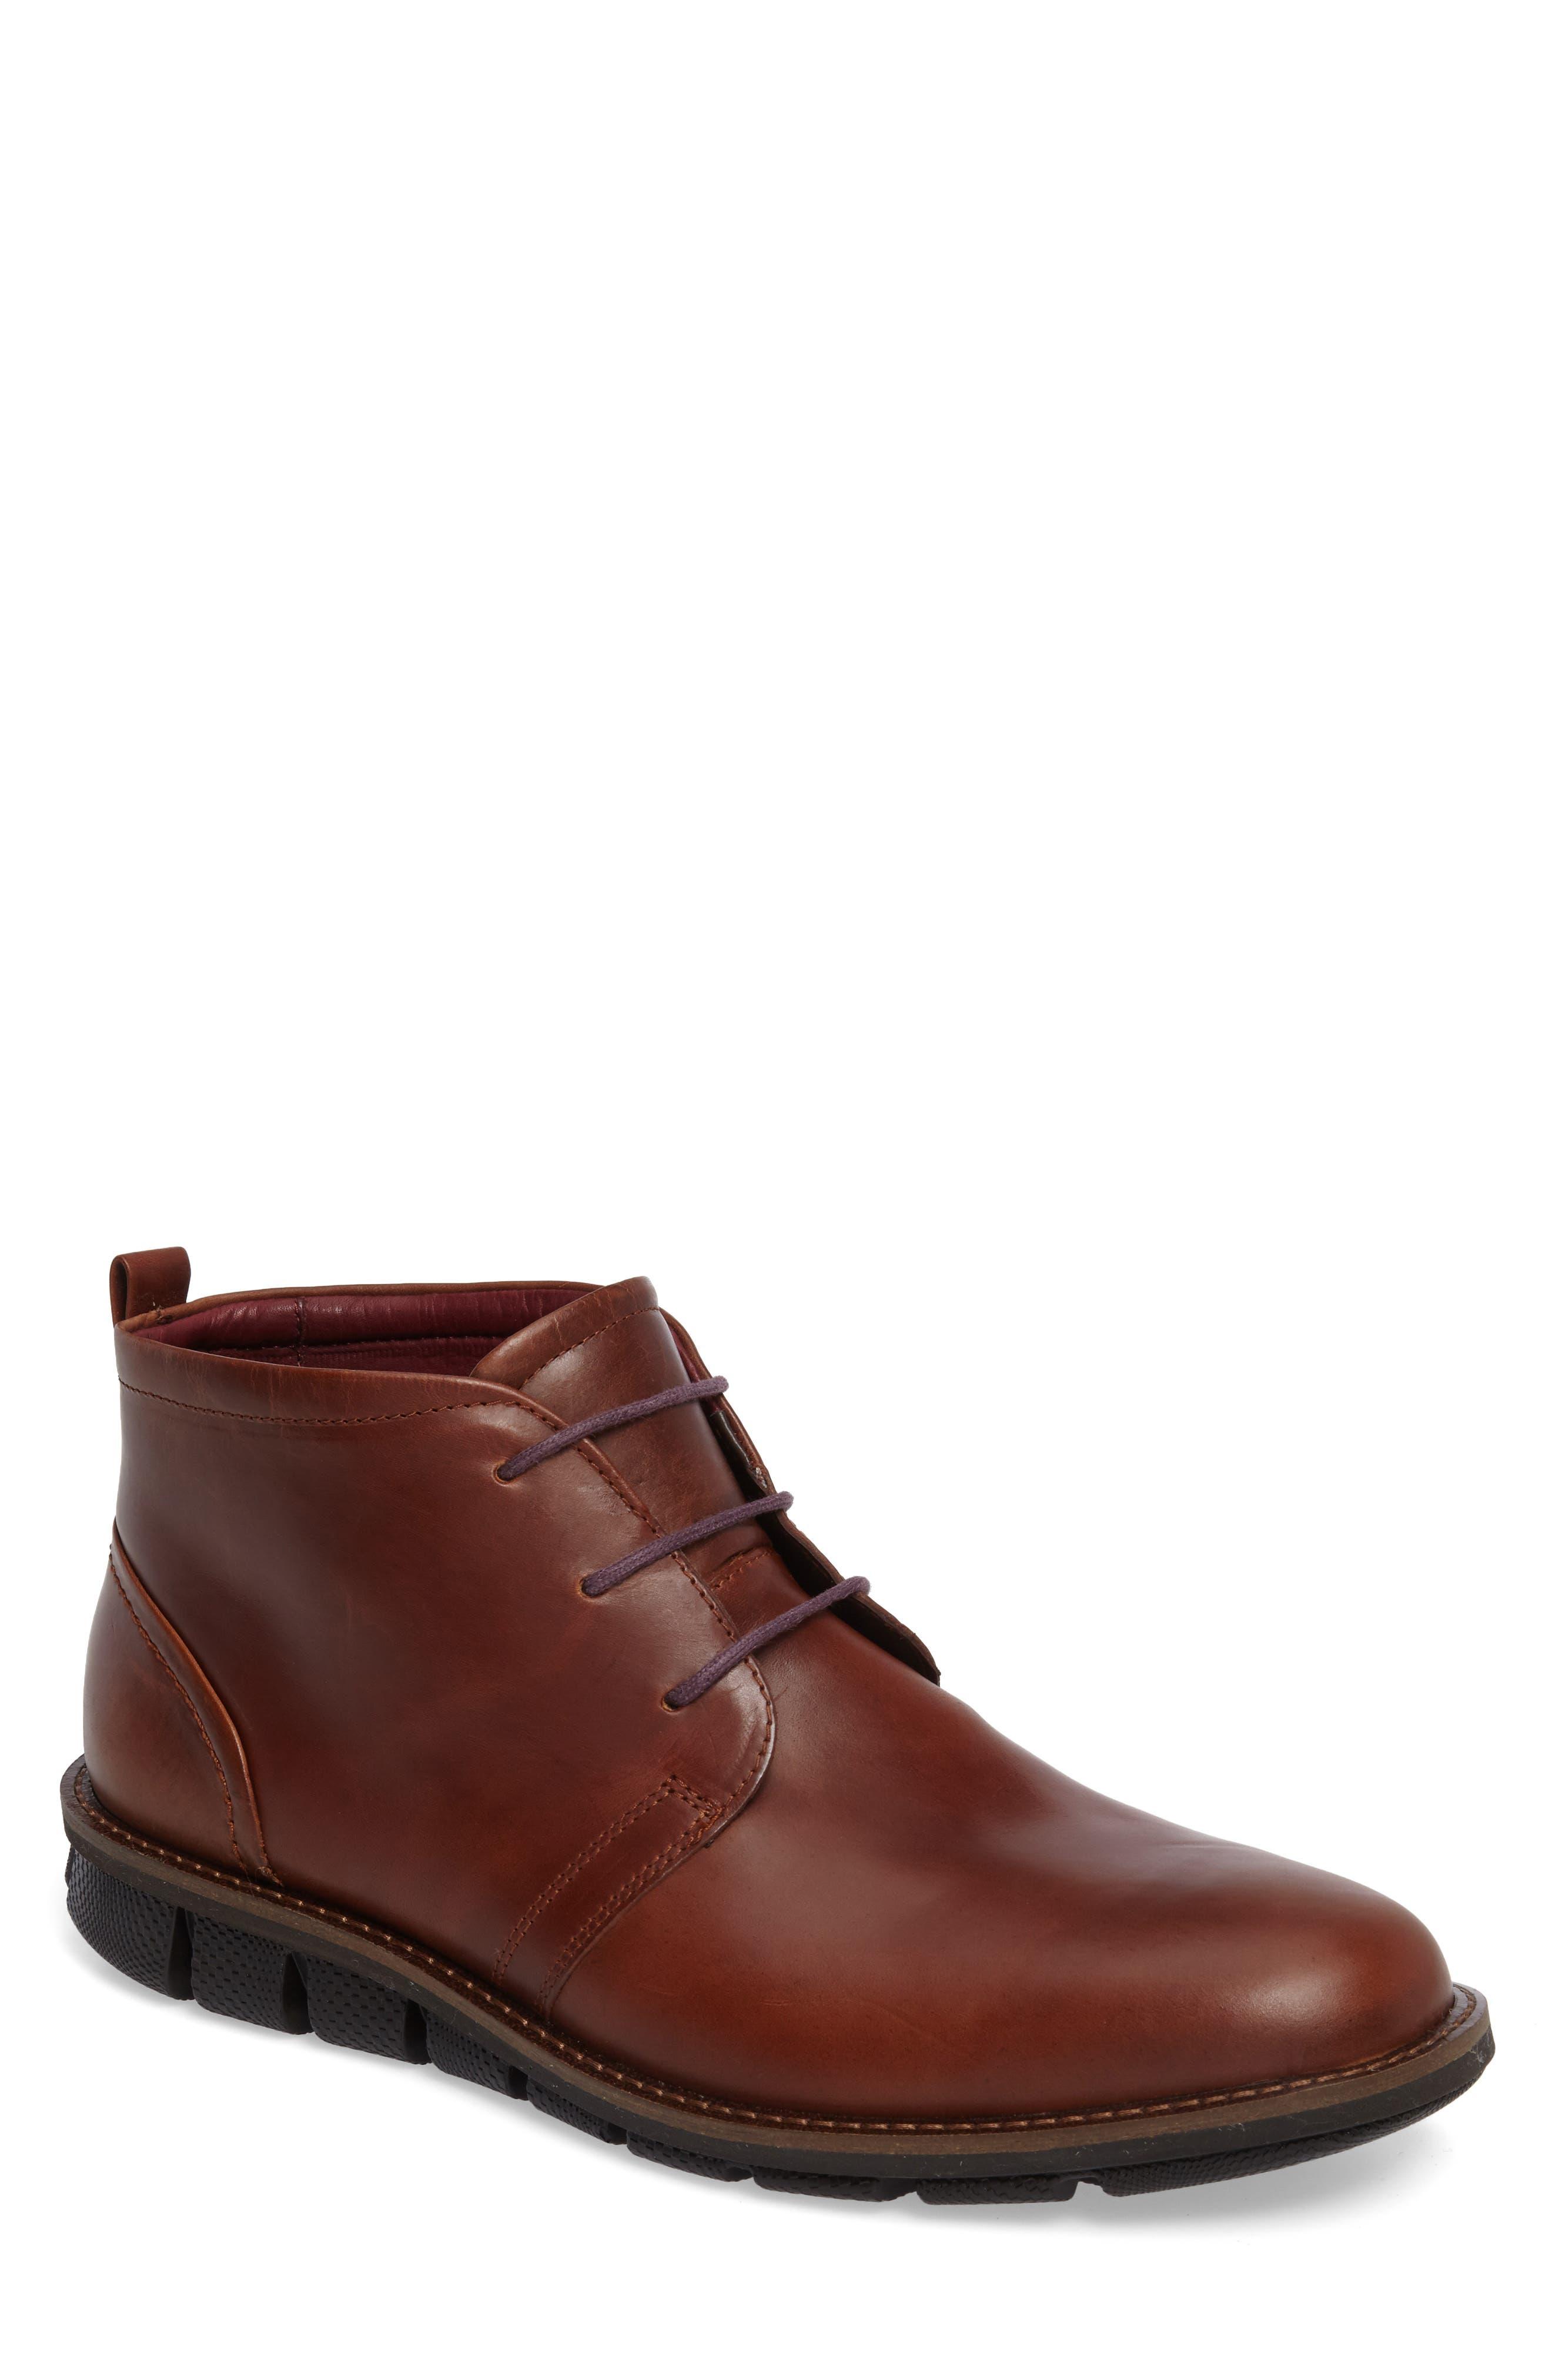 ECCO Jeremy Hybrid Plain Toe Boot